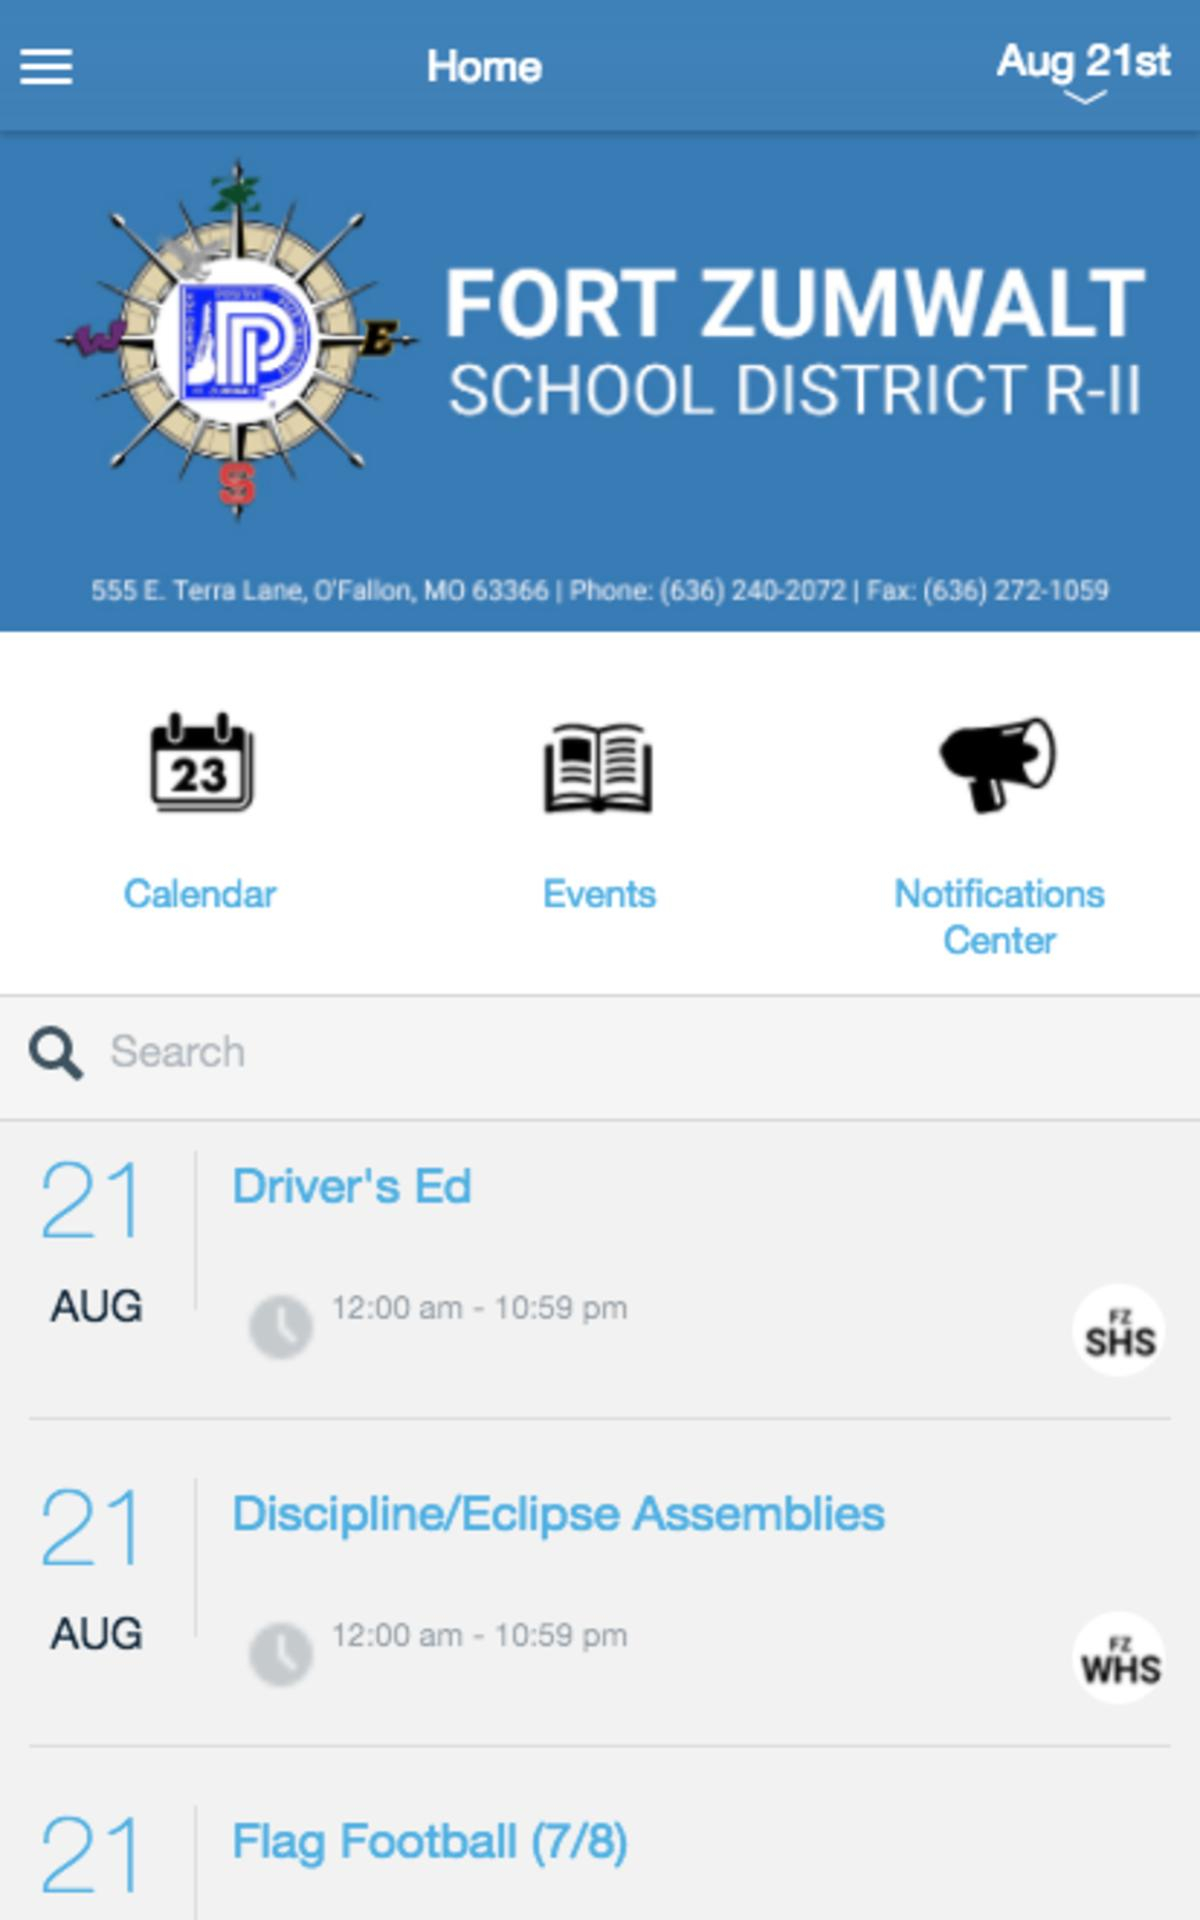 Fort Zumwalt School District For Android - Apk Download With Fort Zumwalt Academic Calendar